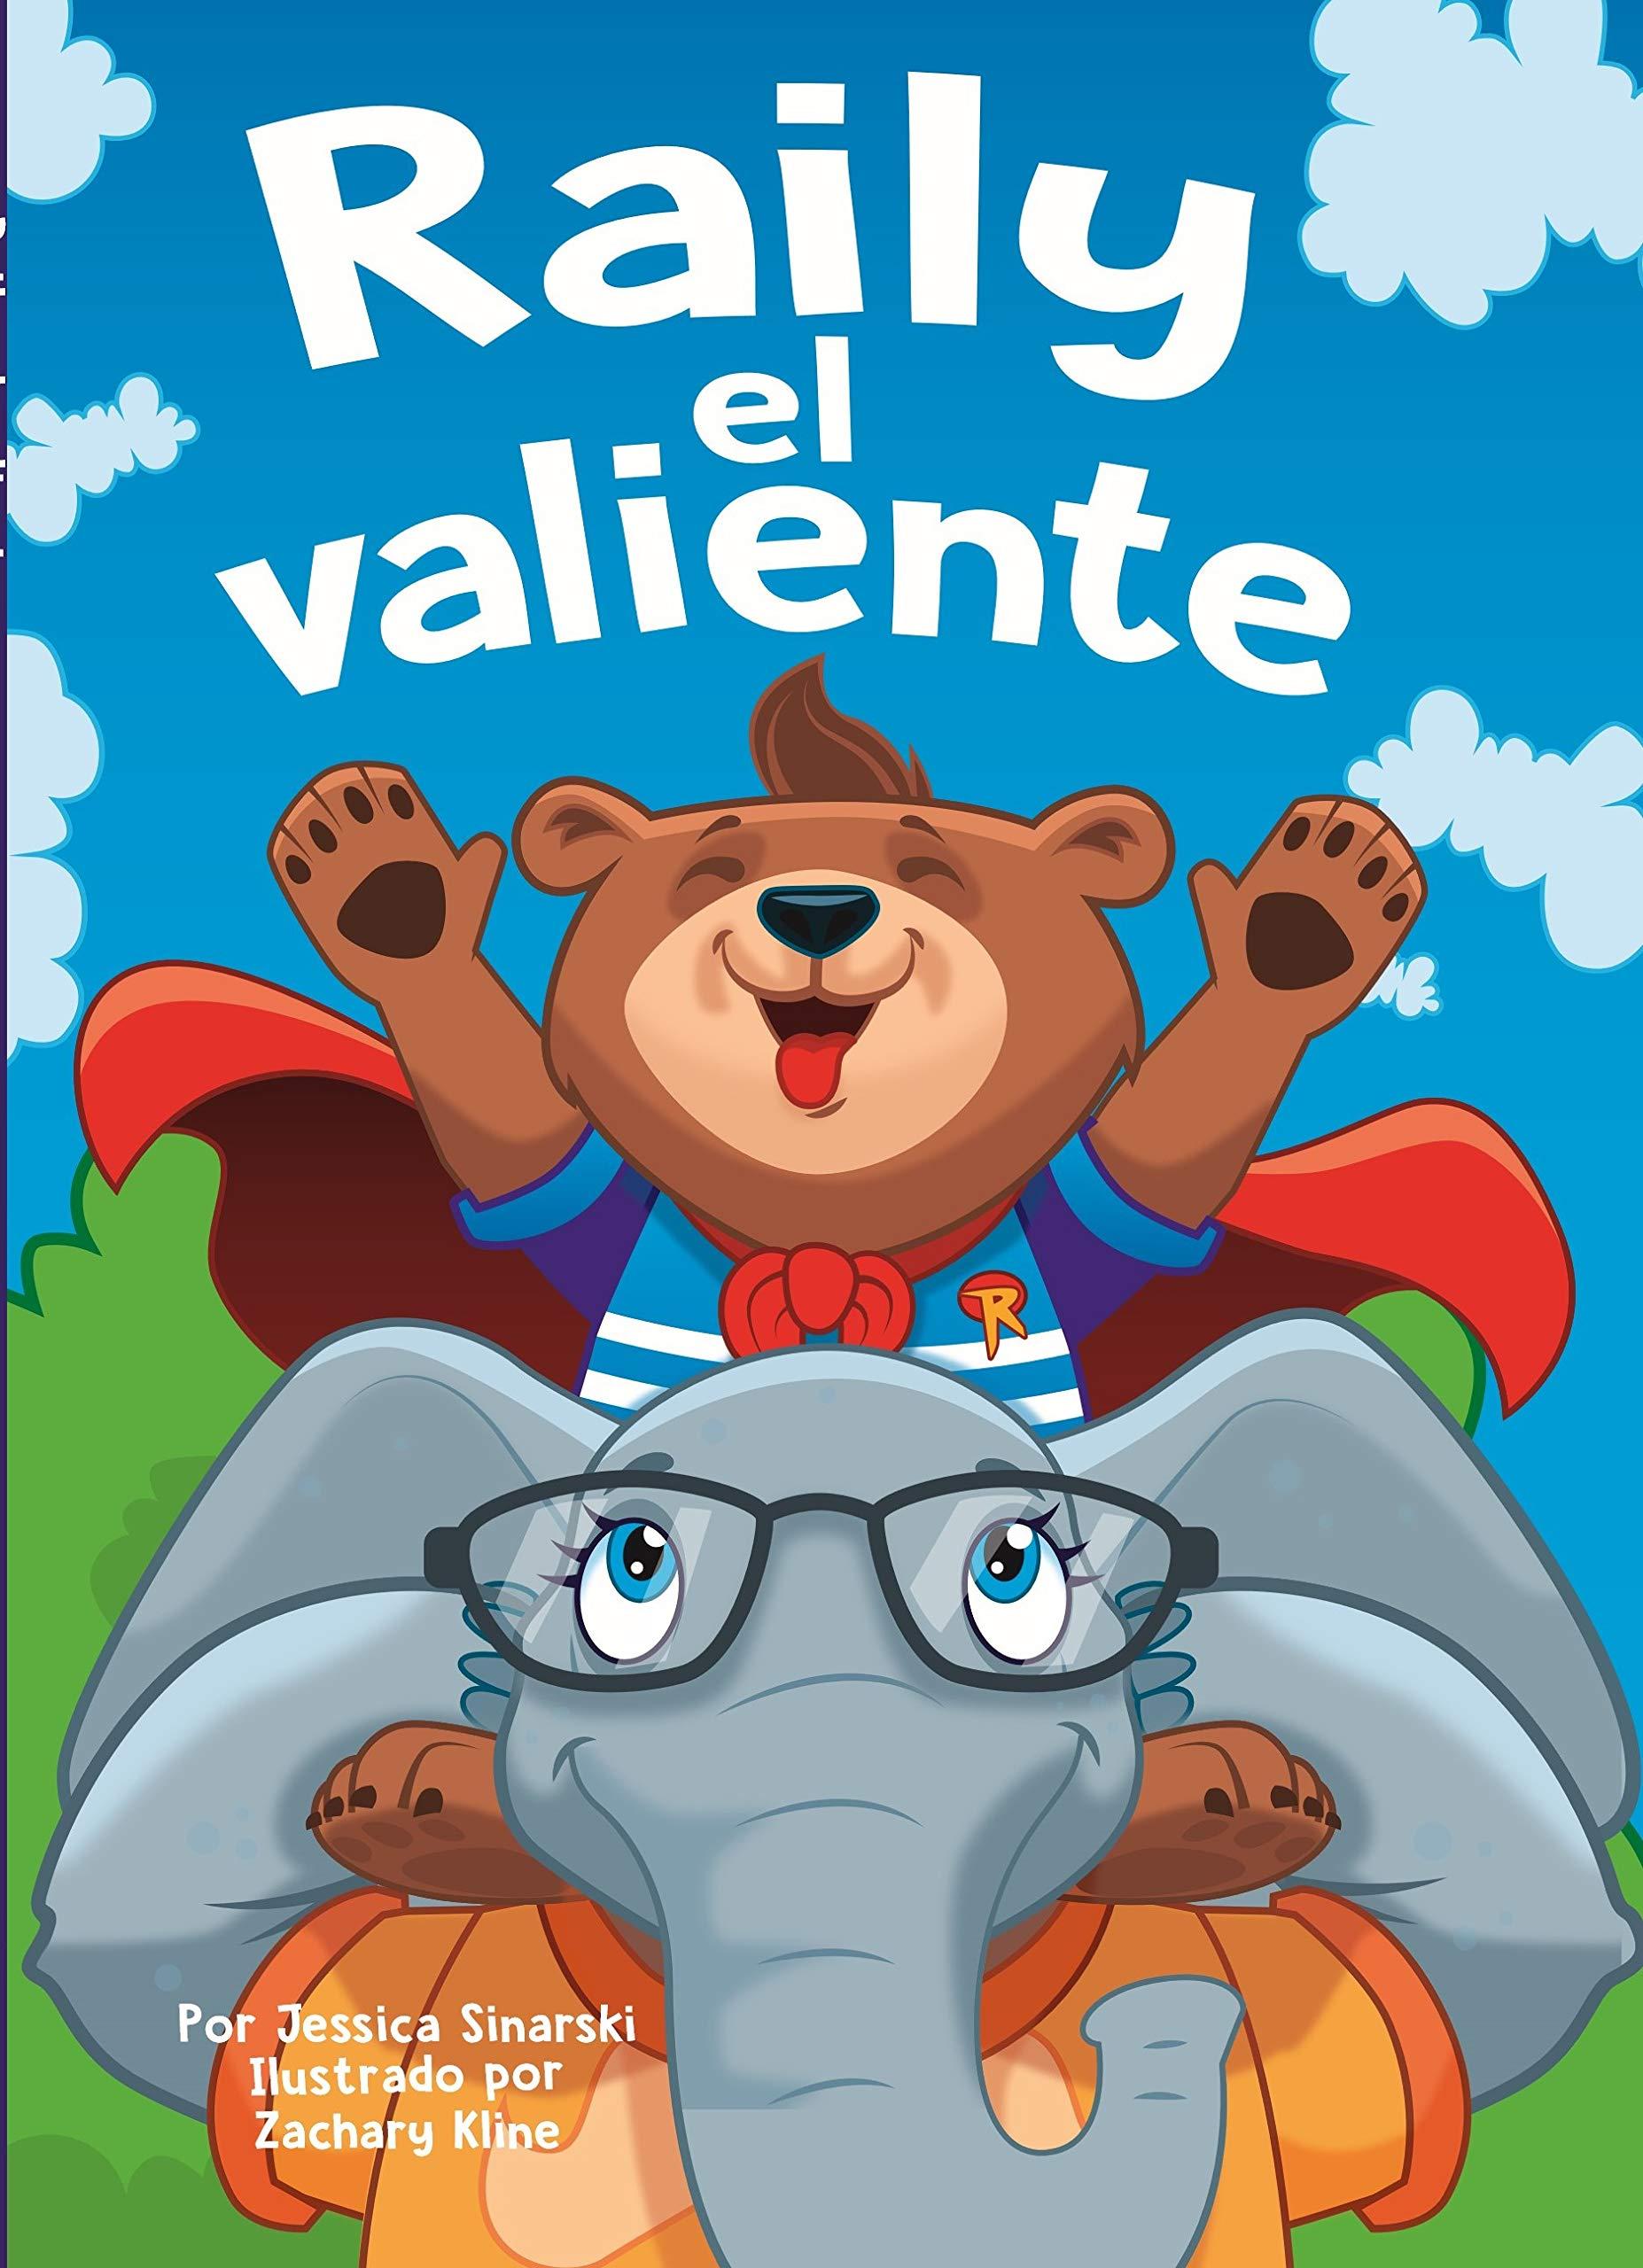 RAILY EL VALIENTE (Riley the Brave - Spanish Edition): Jessica Sinarski,  Zachary Kline: 9780999234013: Amazon.com: Books